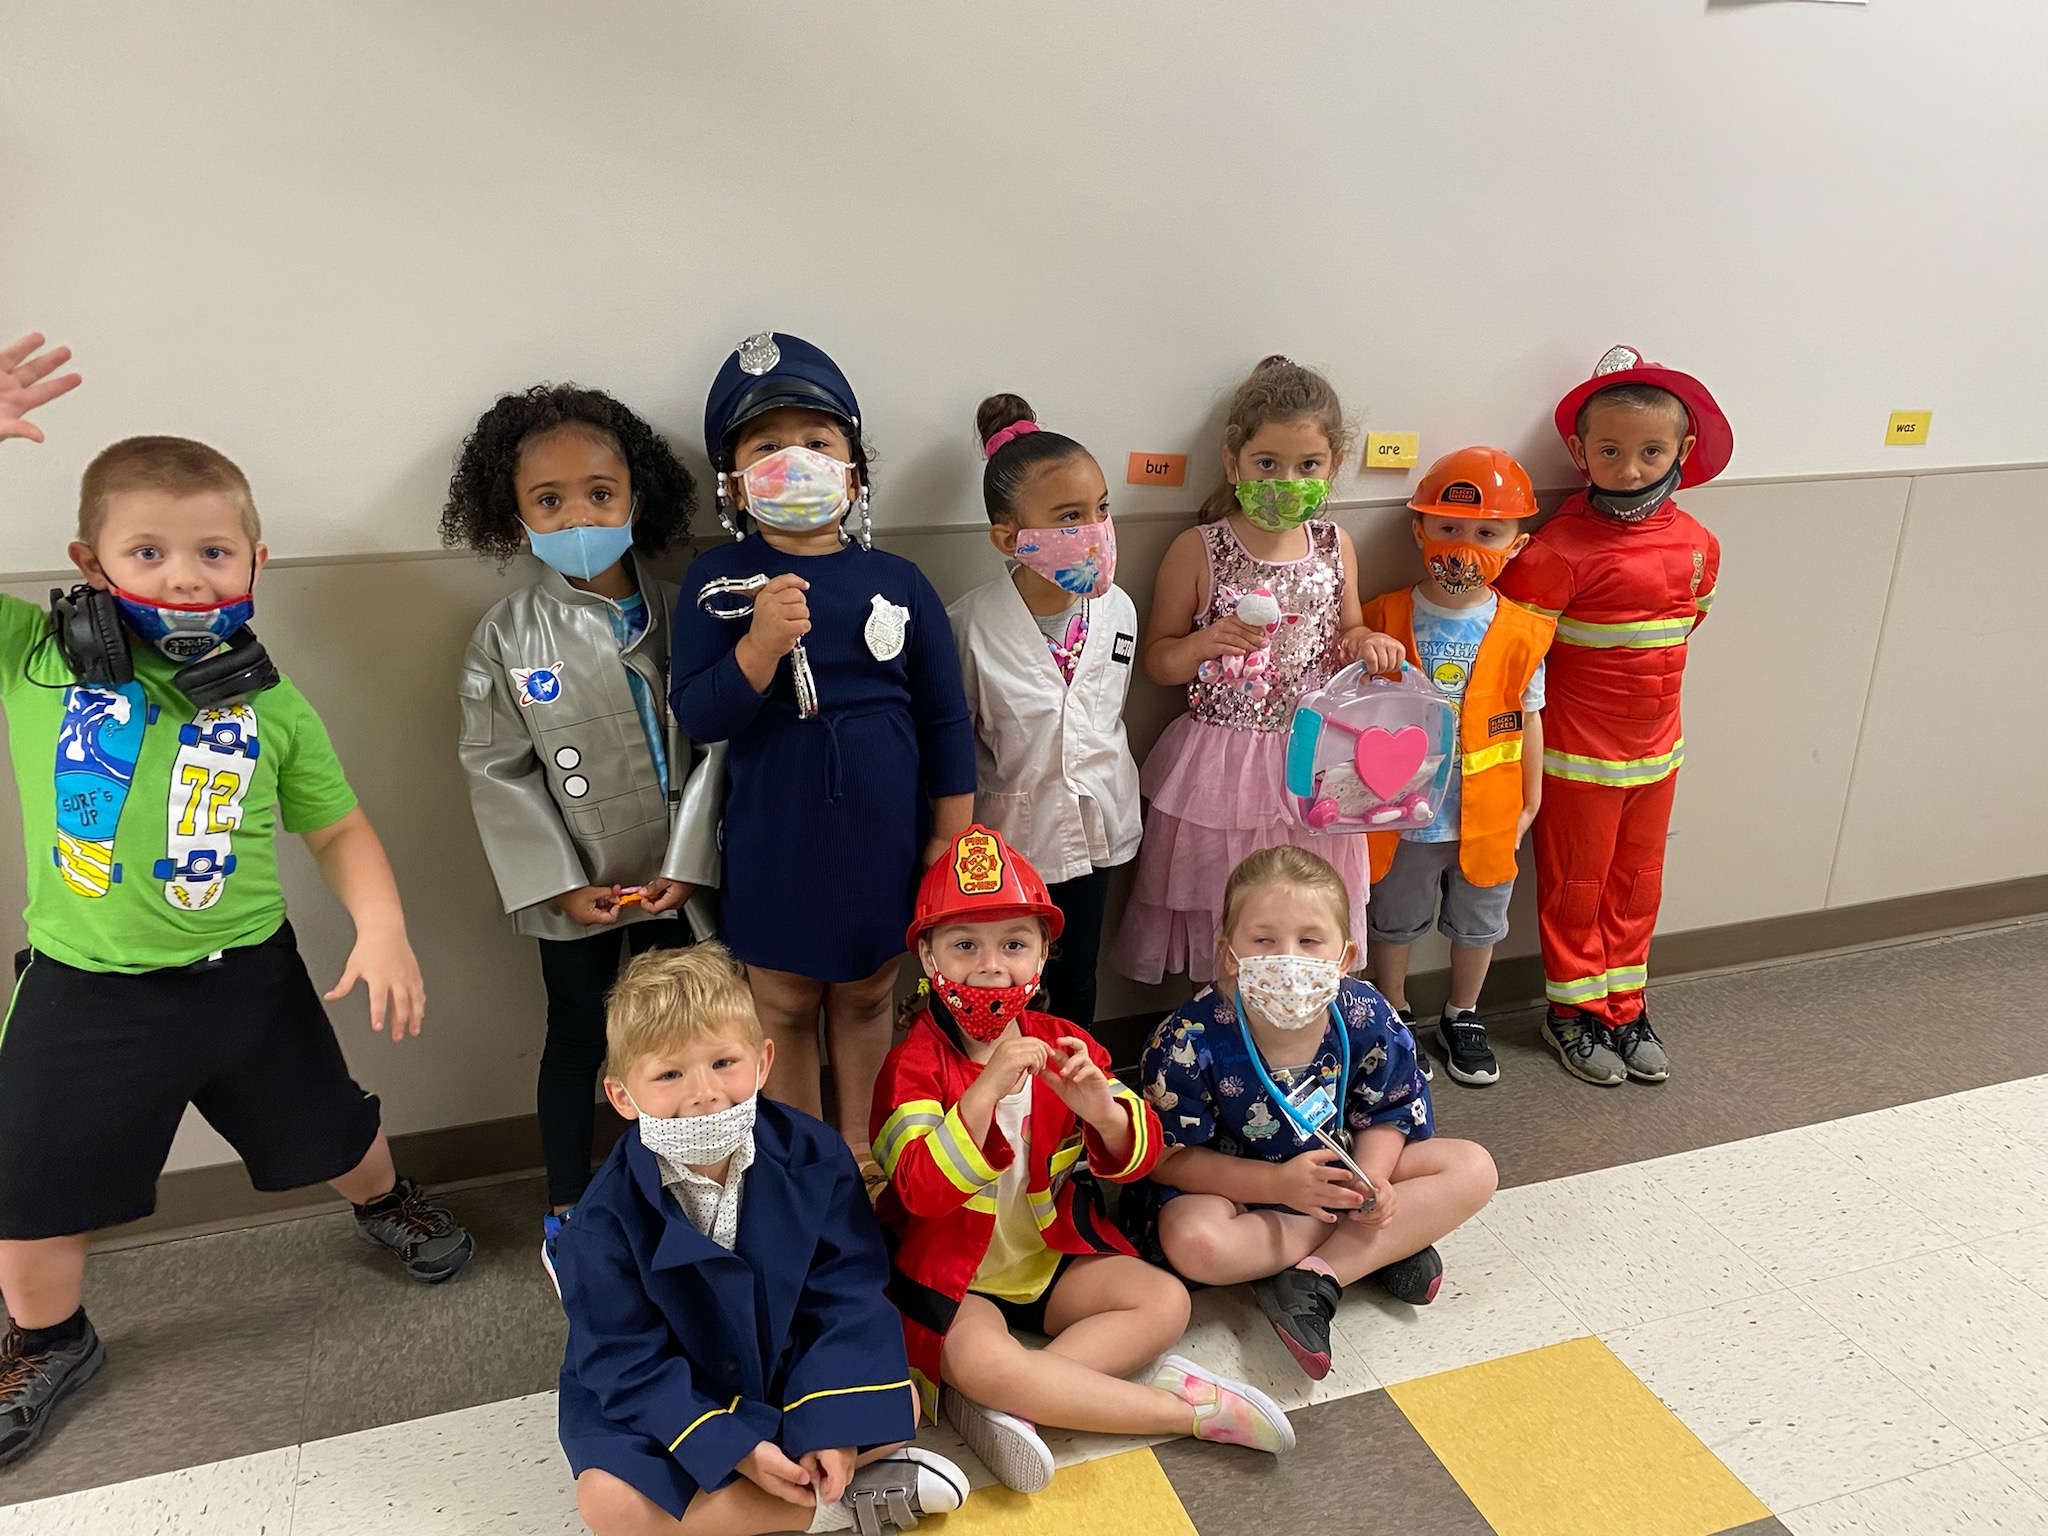 group of kids dressed in career clothing